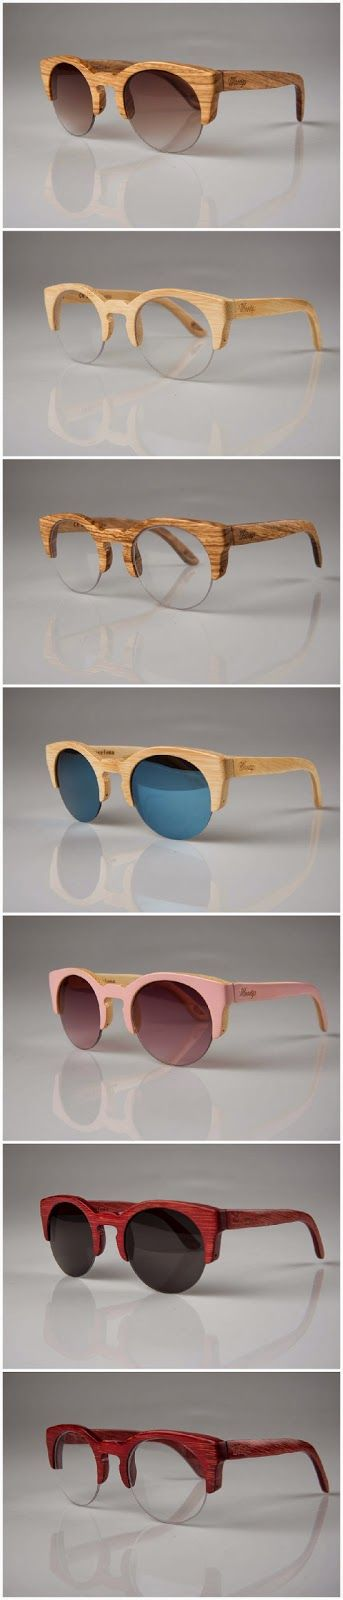 Woodys Barcelona, Gafas de madera, Wood sunglasses, Montura de madera: Hiroto 0.33 el modelo de Blanca Suárez